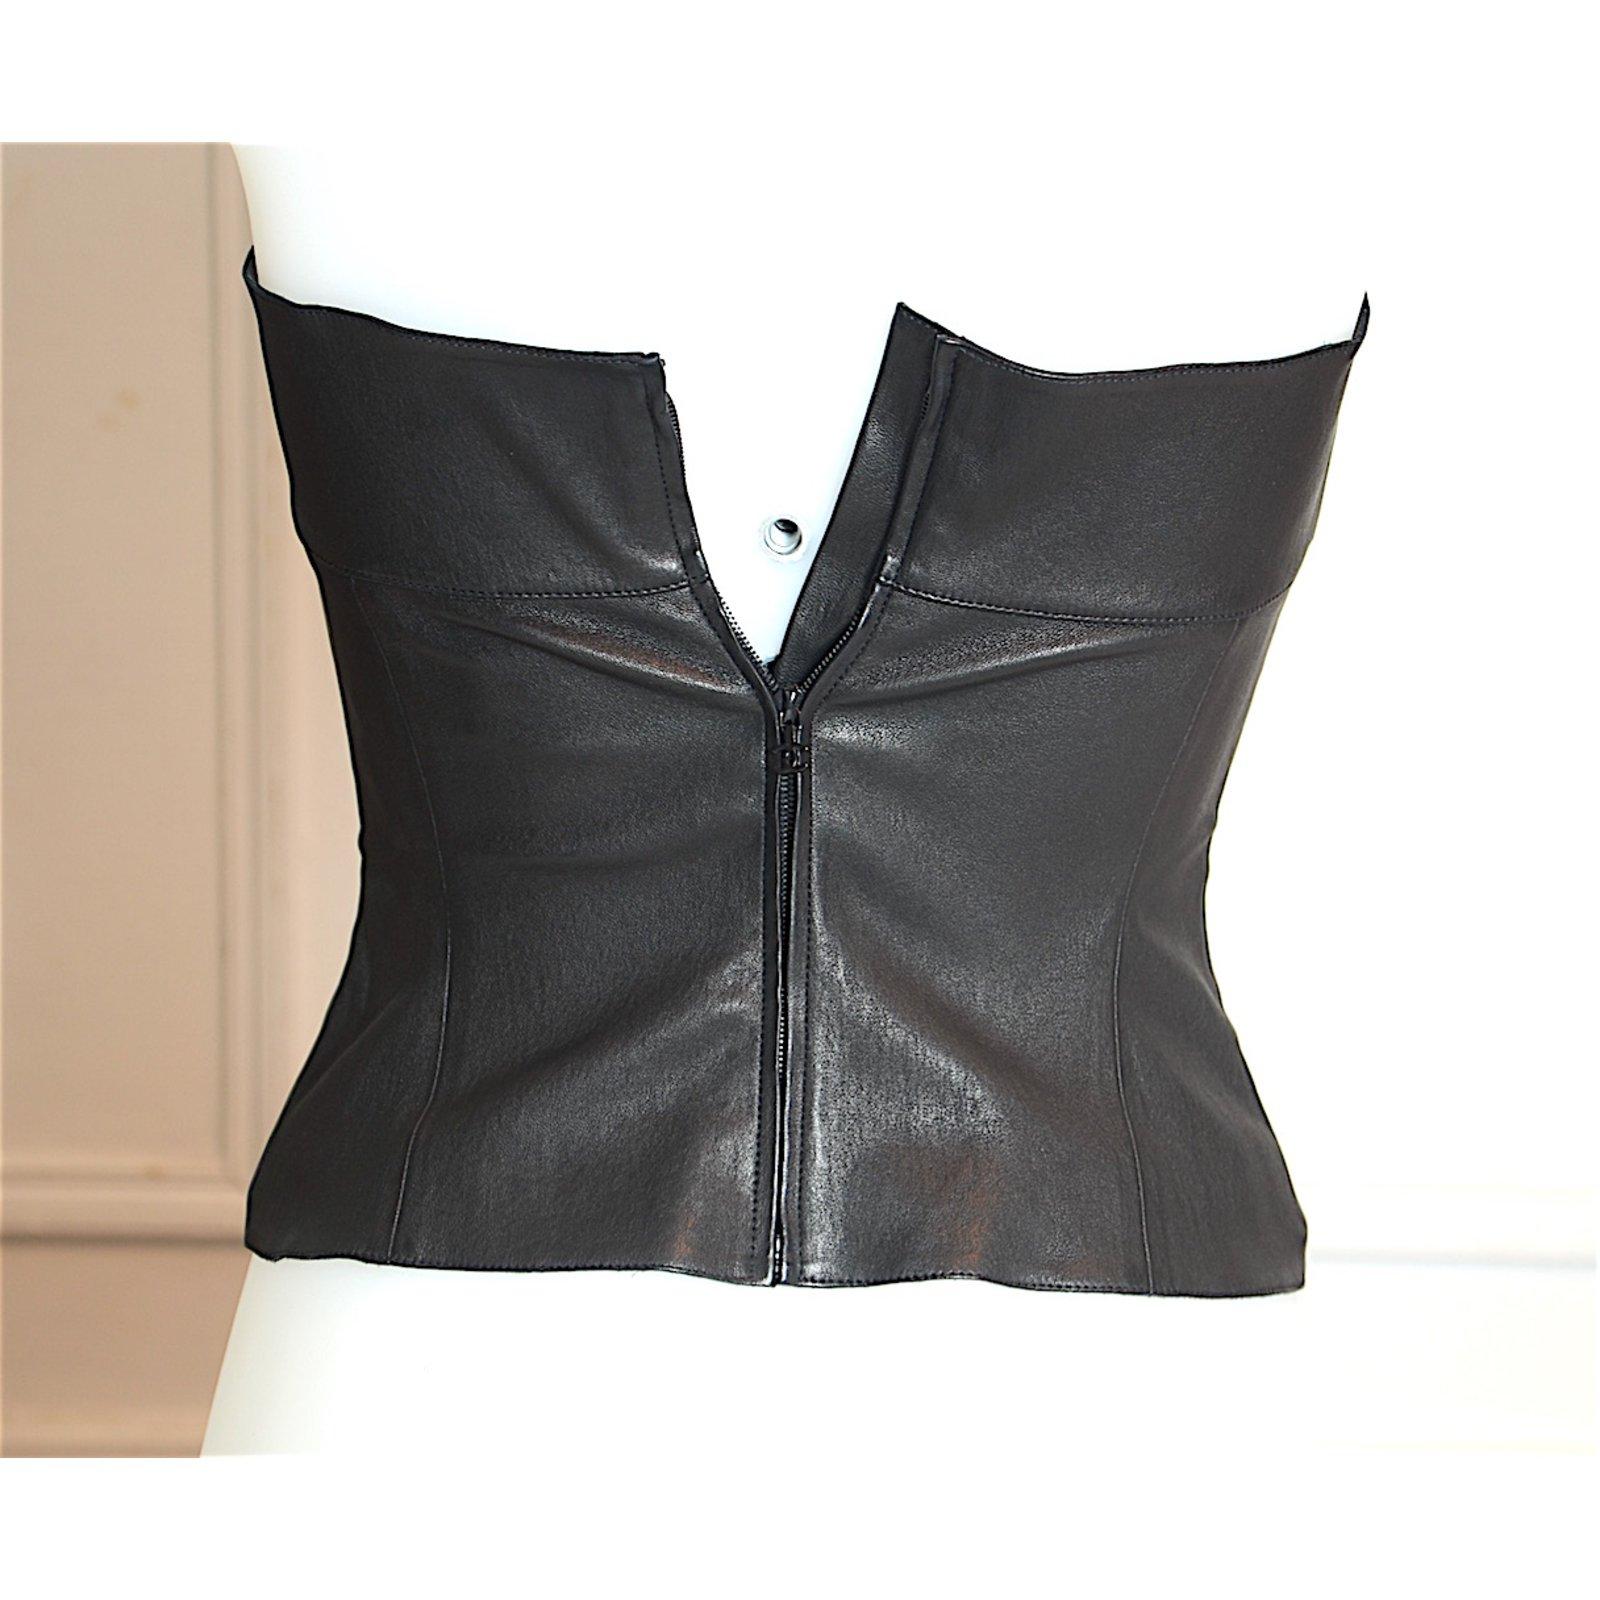 tops chanel bustier en cuir chanel cuir noir joli closet. Black Bedroom Furniture Sets. Home Design Ideas